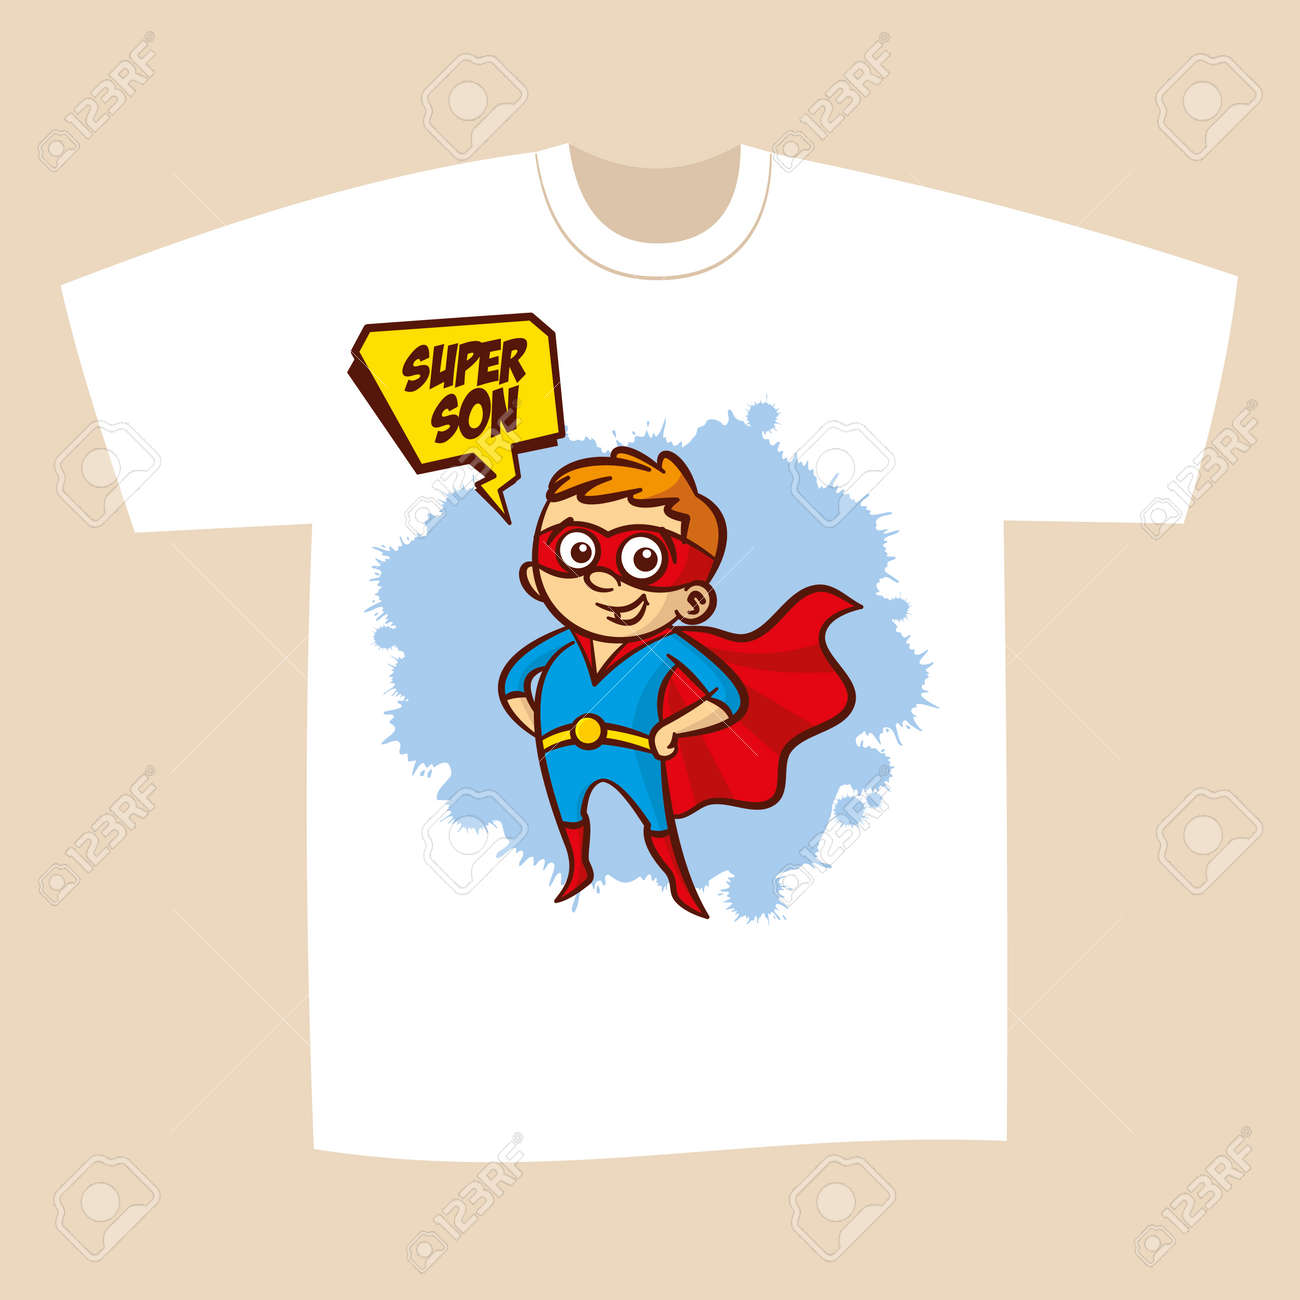 20e7ce0d T-shirt Print Design Superhero Son Sticker Vector Illustration Stock Vector  - 71808767